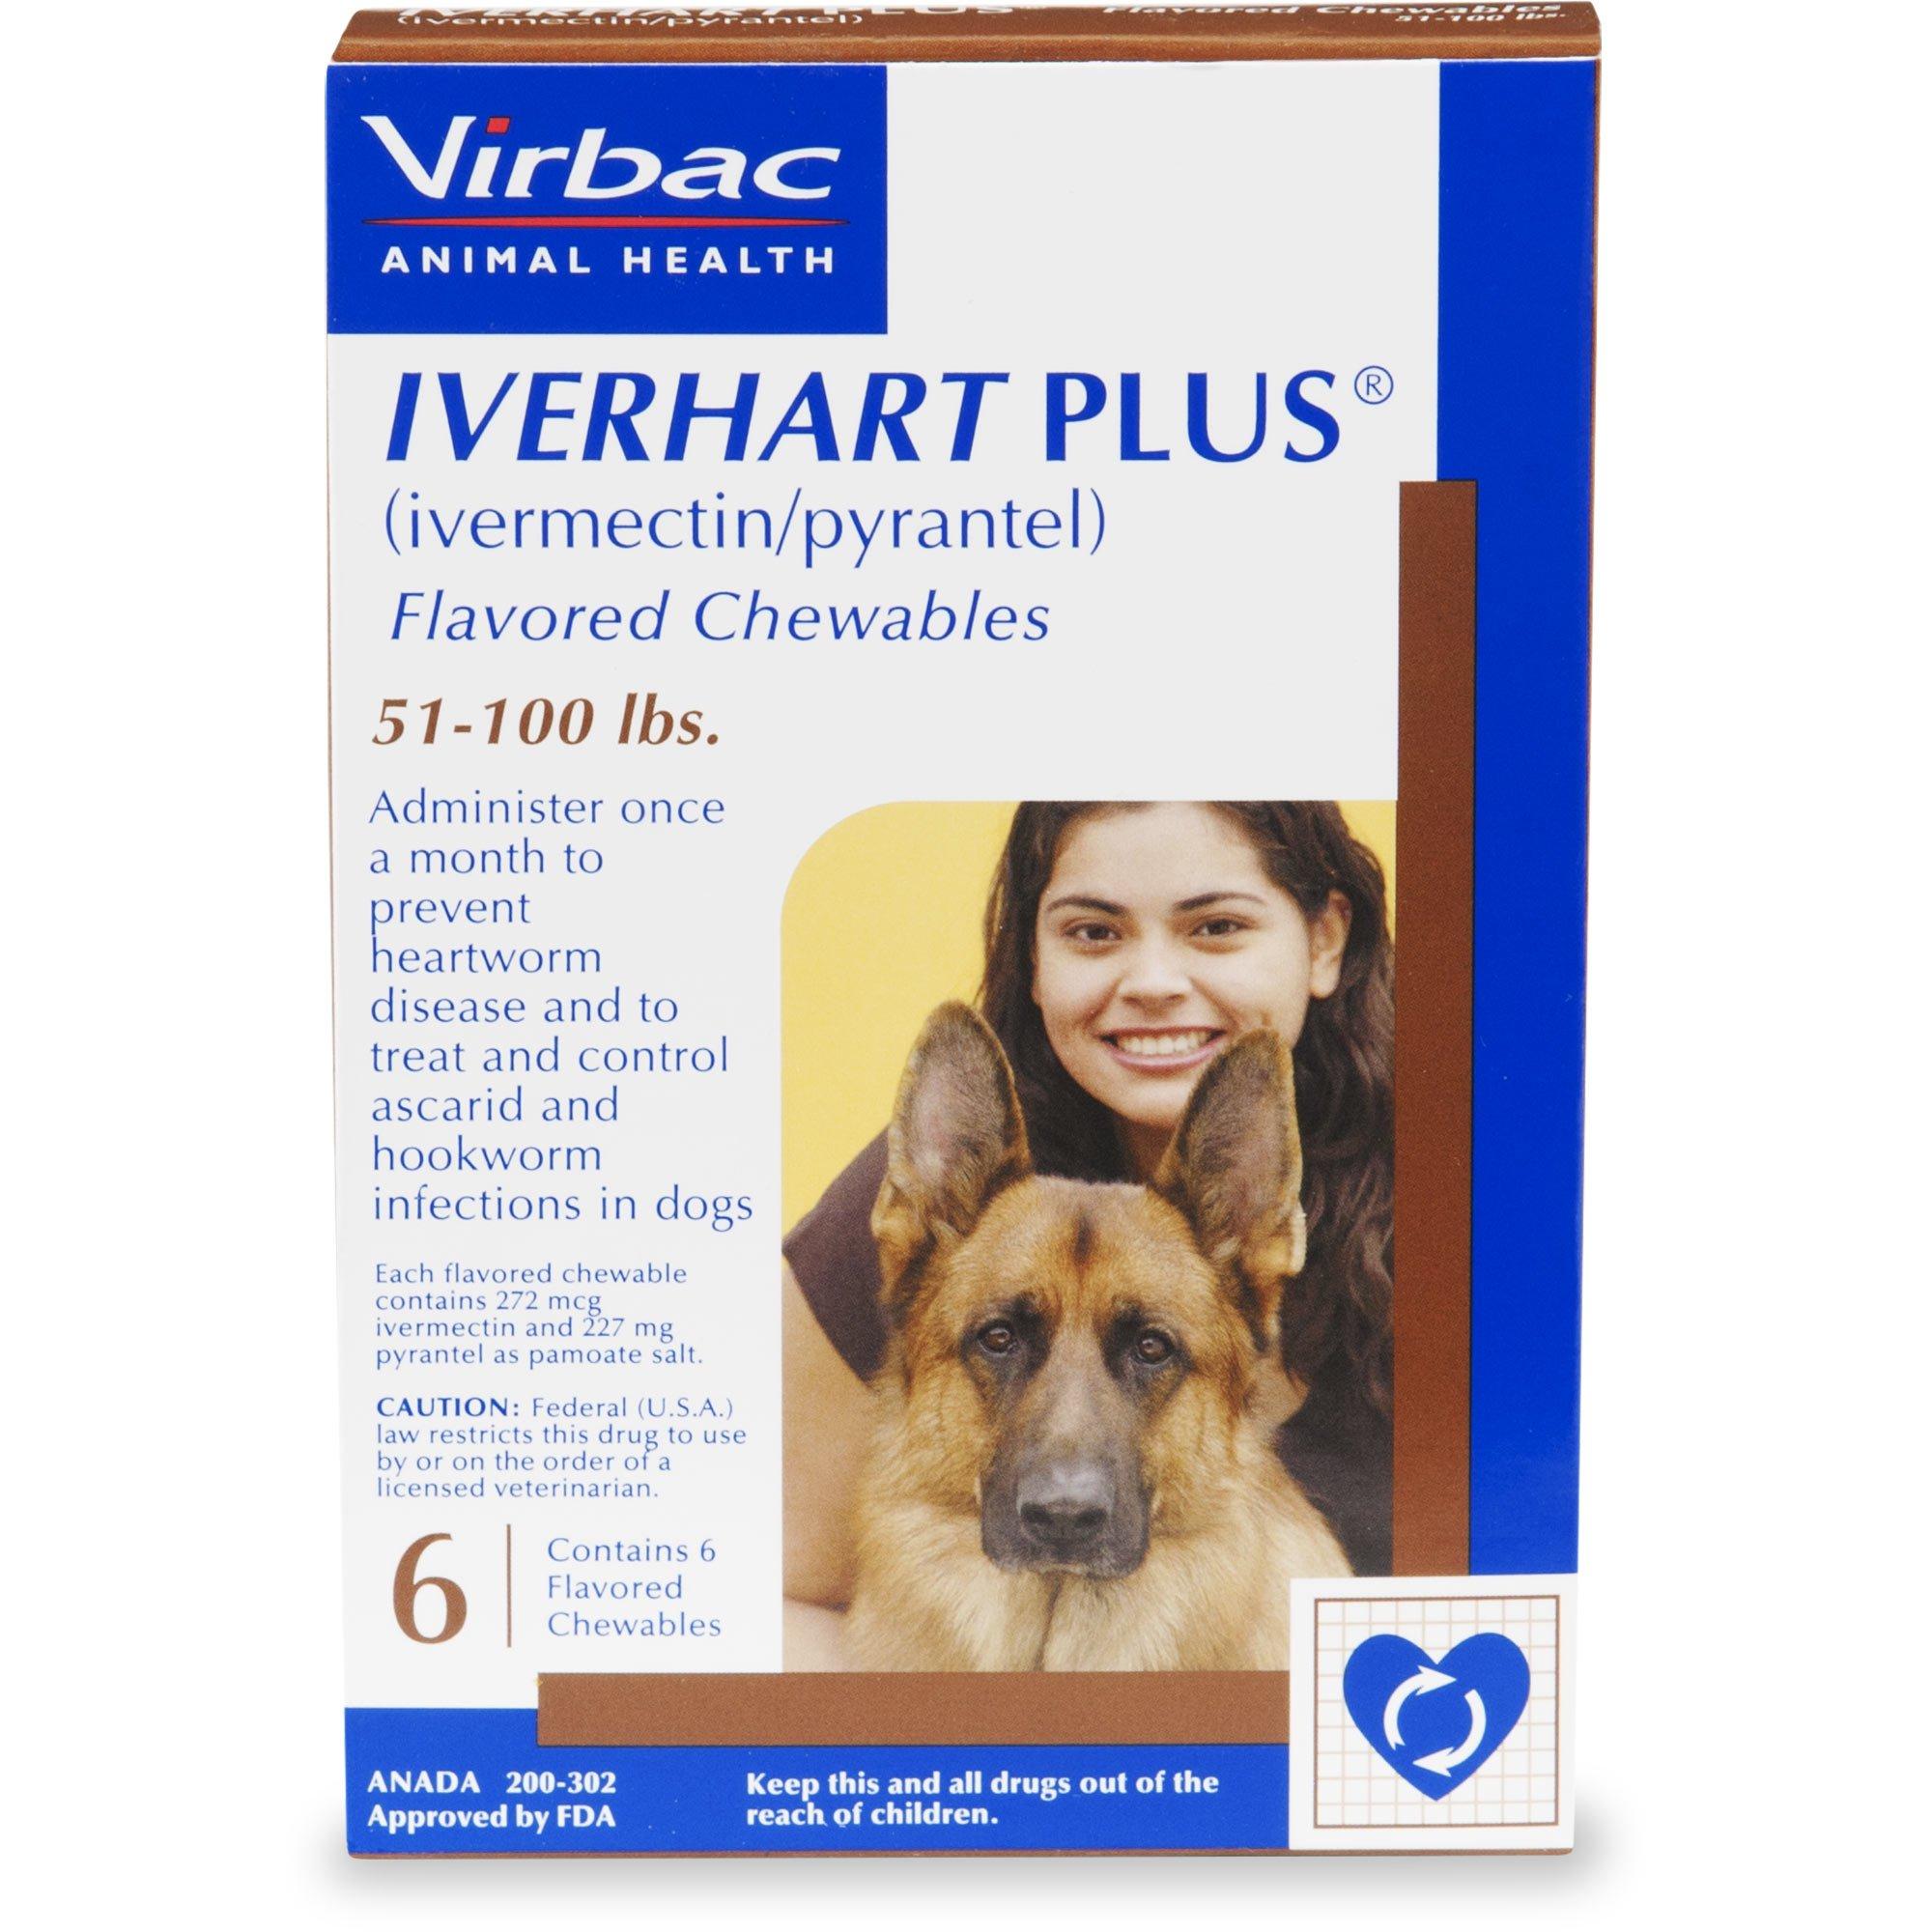 Iverhart Plus Chewable Tablets For Dogs 51 100 Lbs 6 Pack Medical Prescription Animal Medicine Pet Health